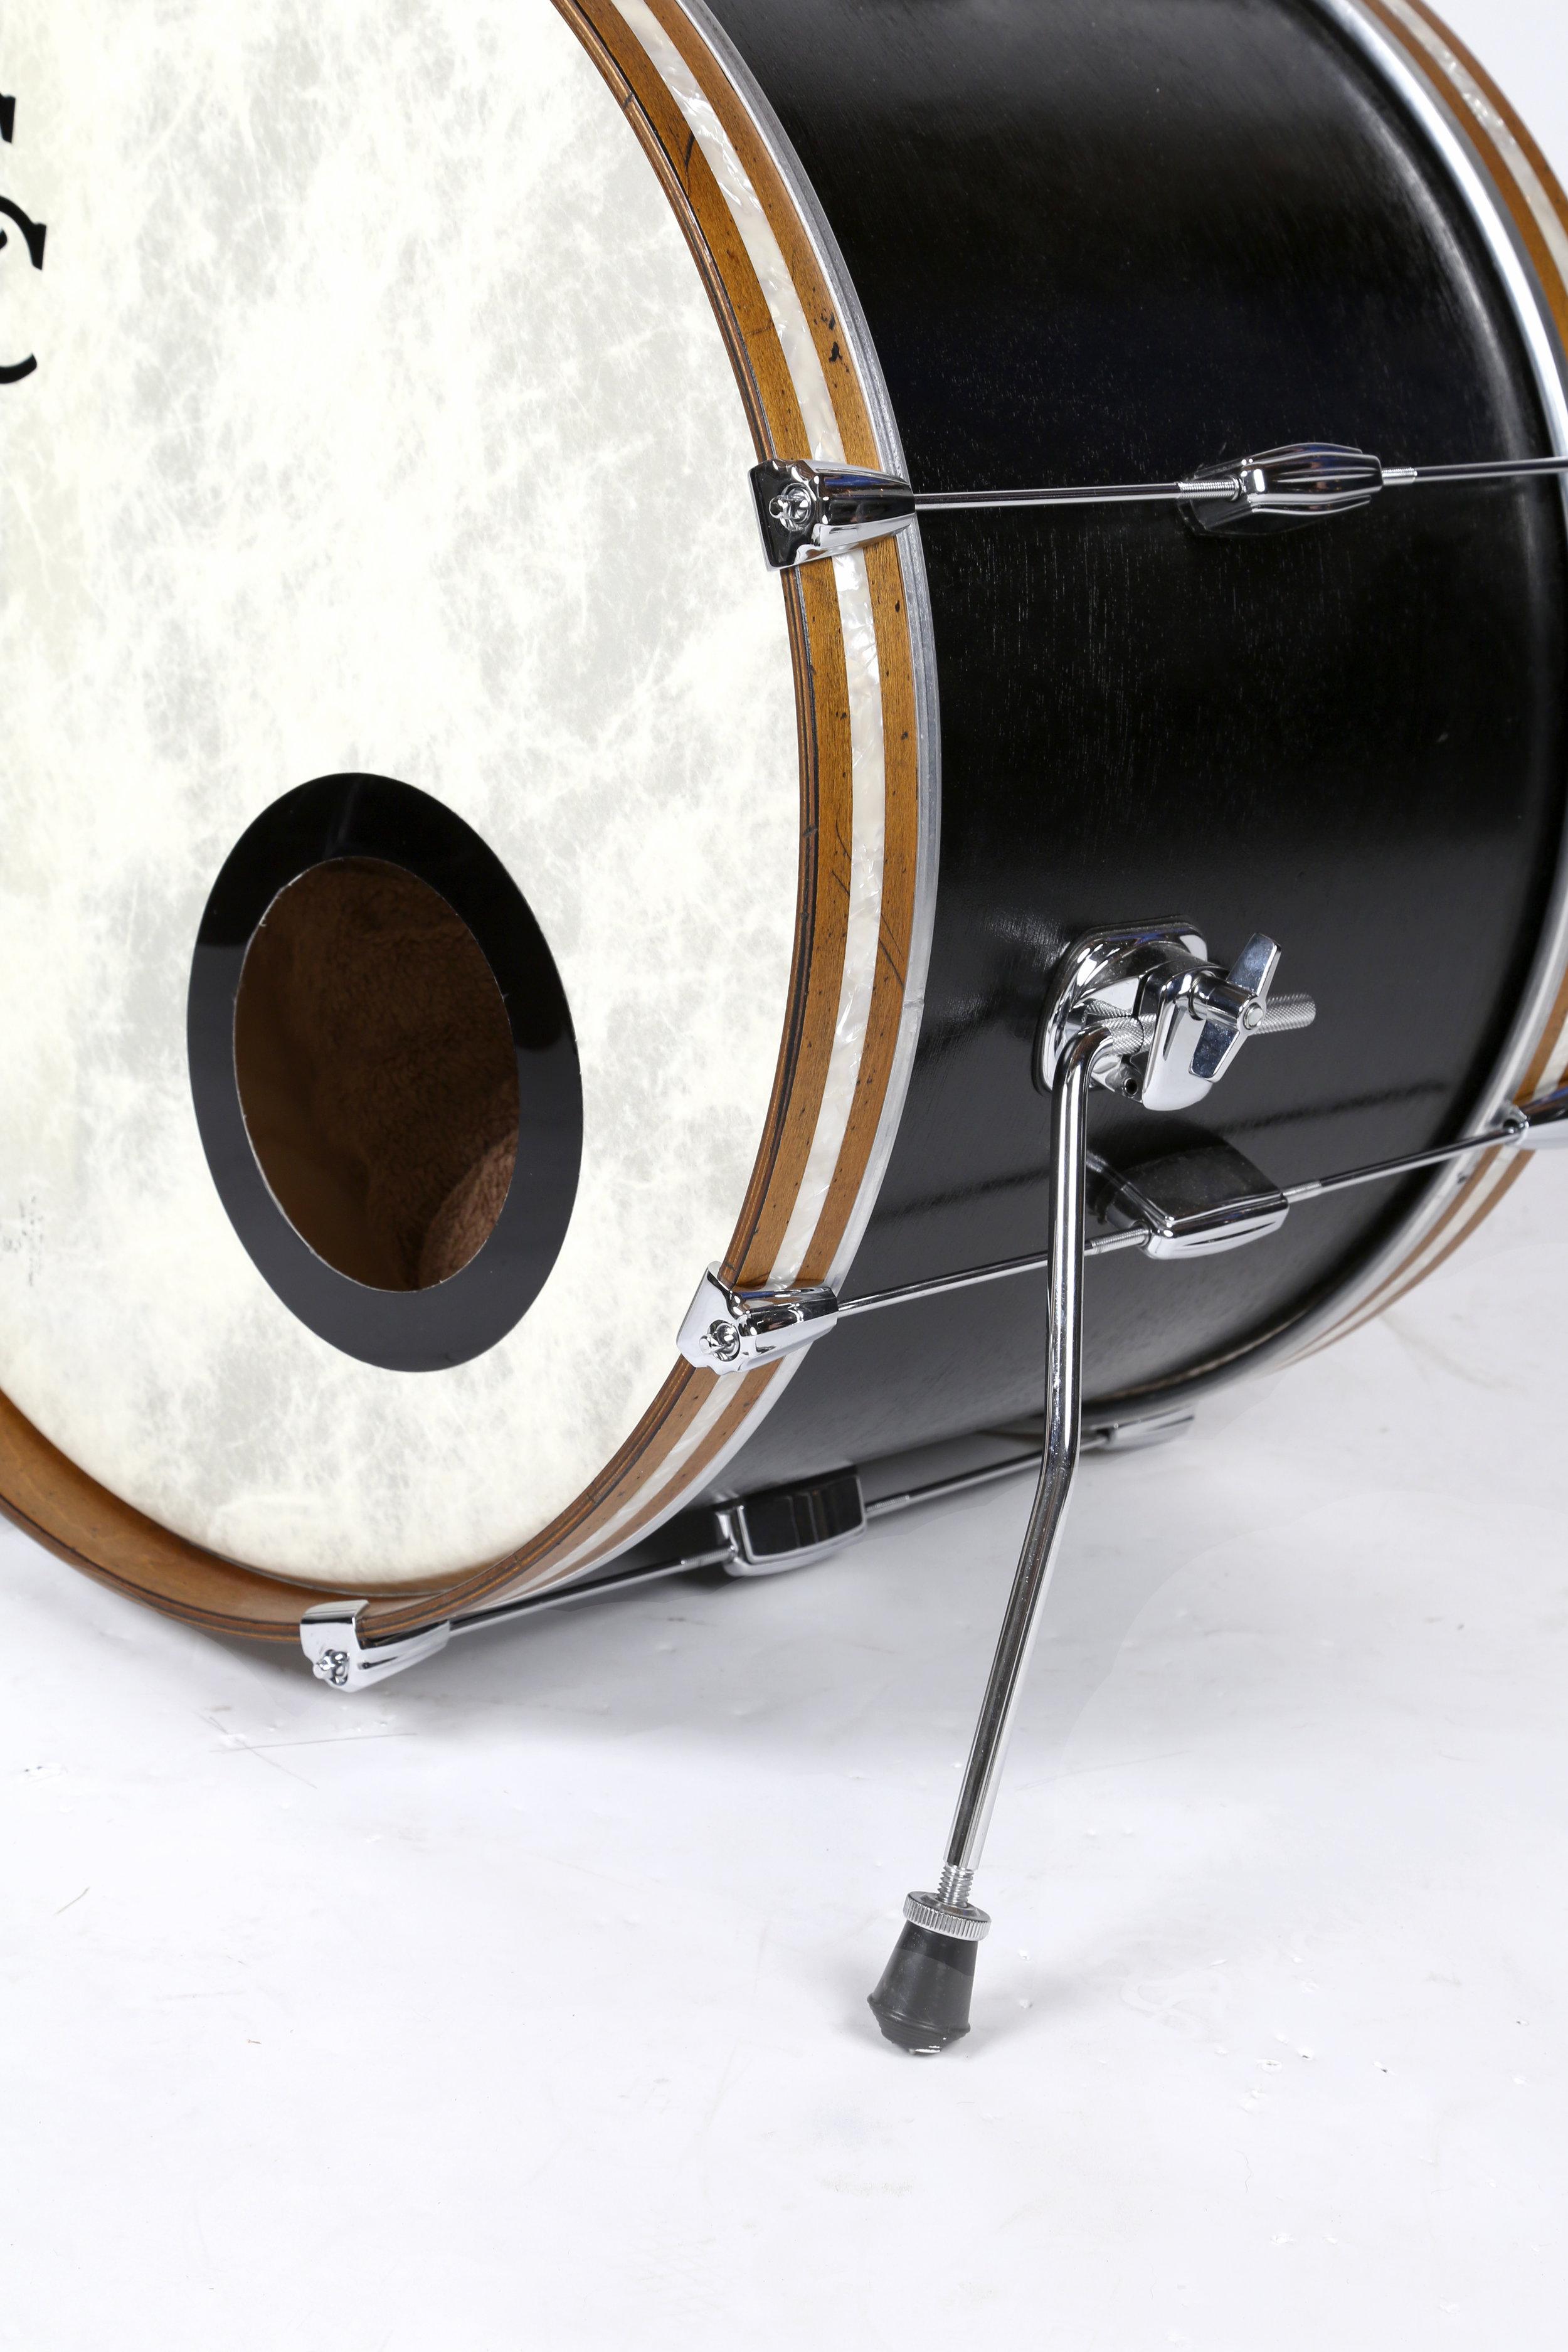 Dorio Vintage Drum_C&C Big Red_1979.jpg